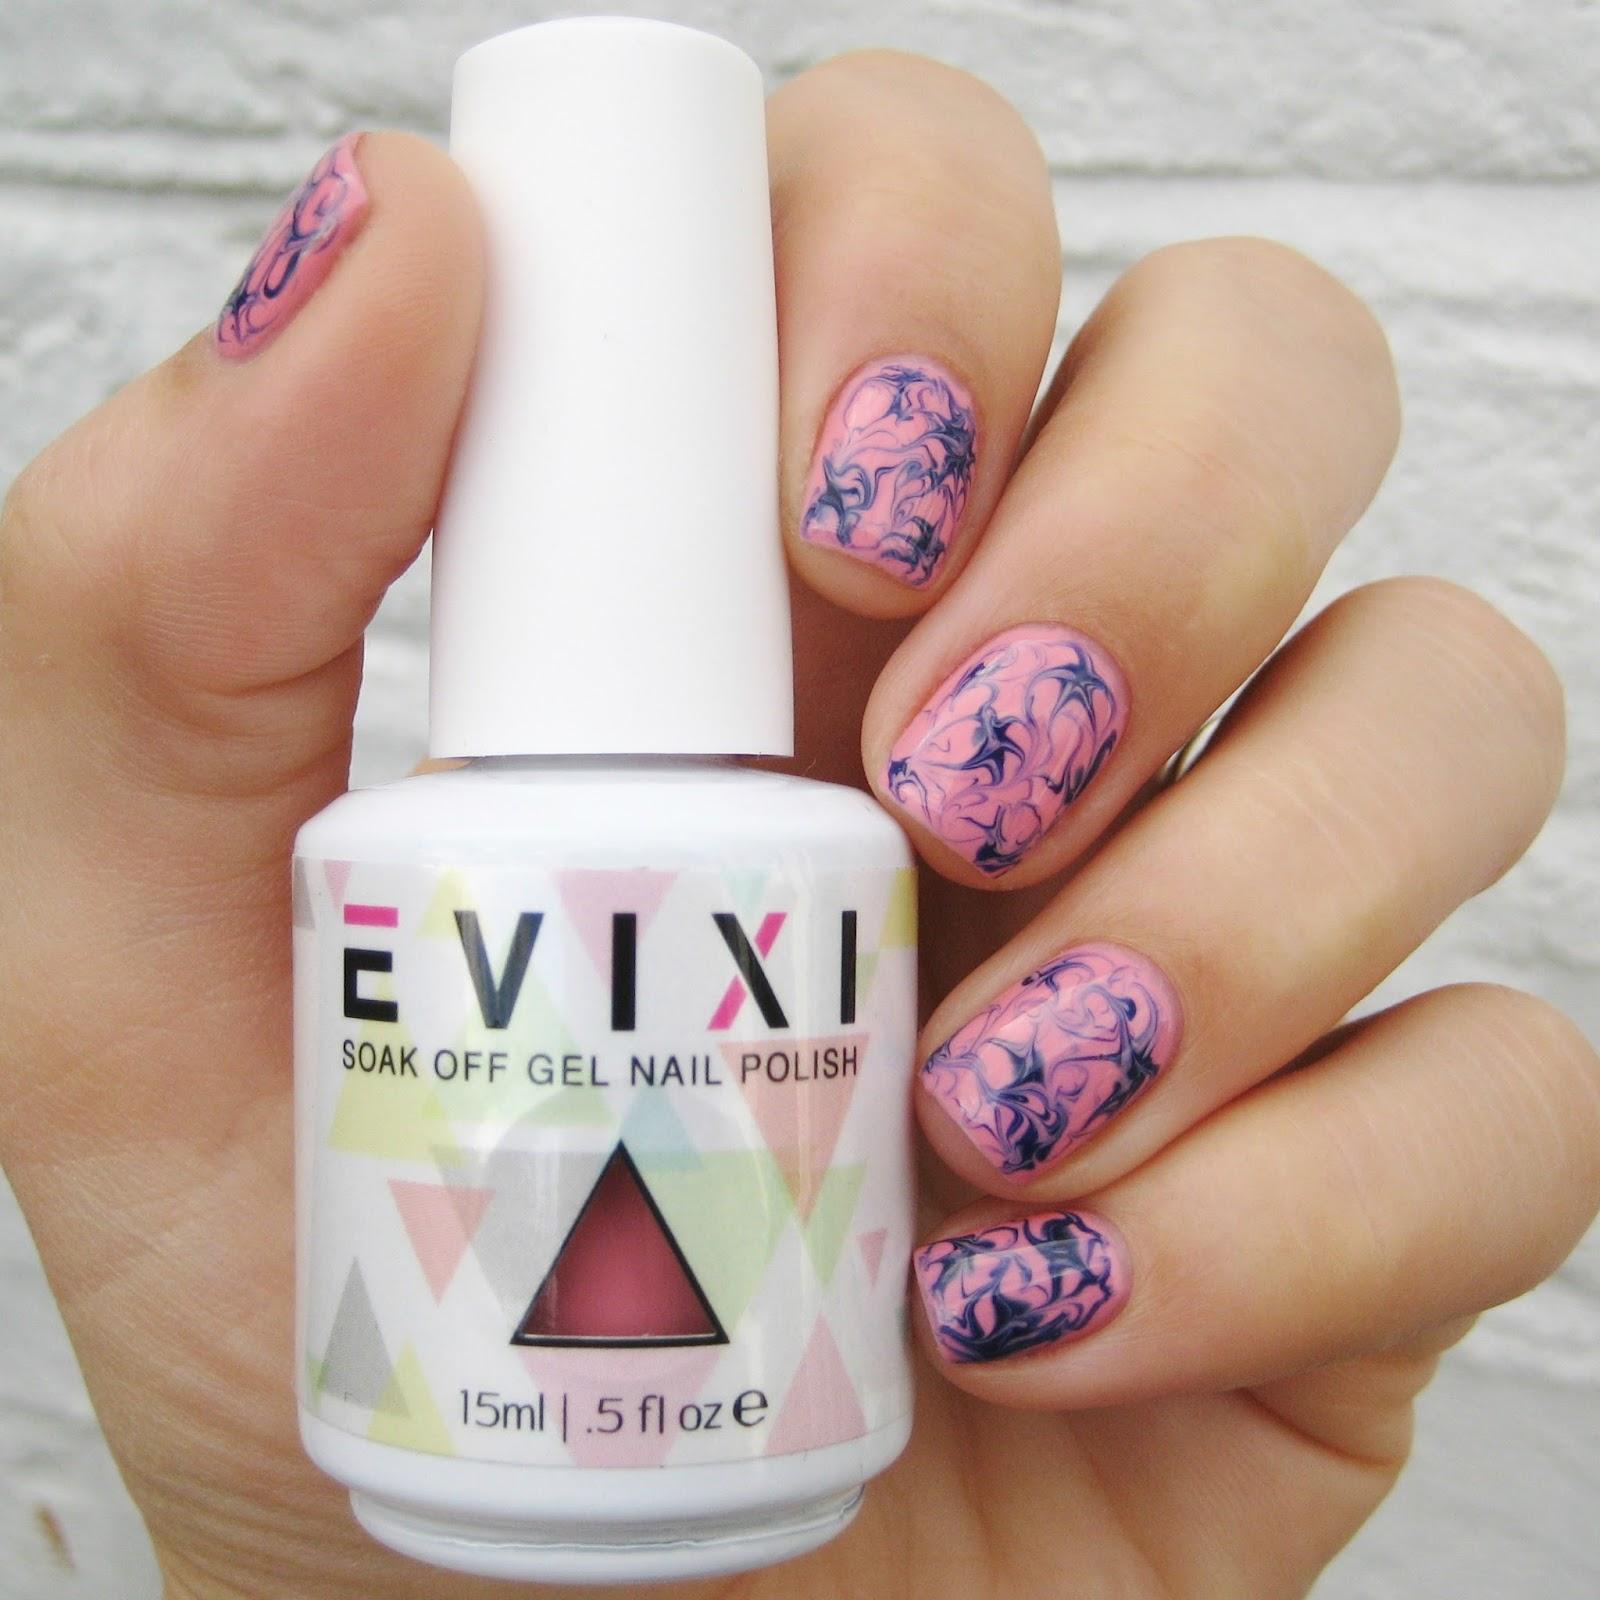 Dahlia Nails: Evixi Gel Review & Marble Mani